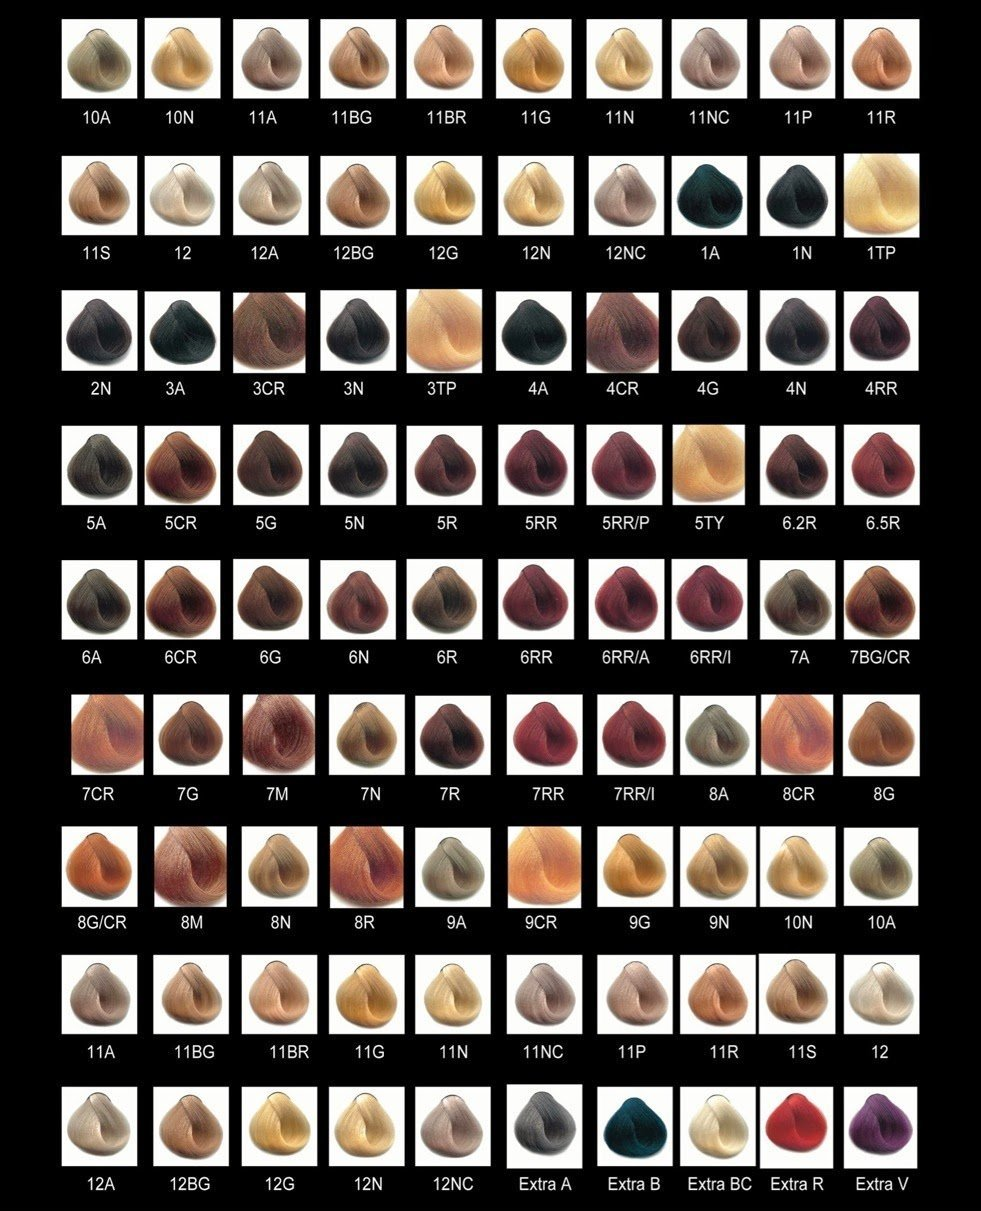 Dyeing Natural Hair- Semi, Demi & Temporary Hair Color